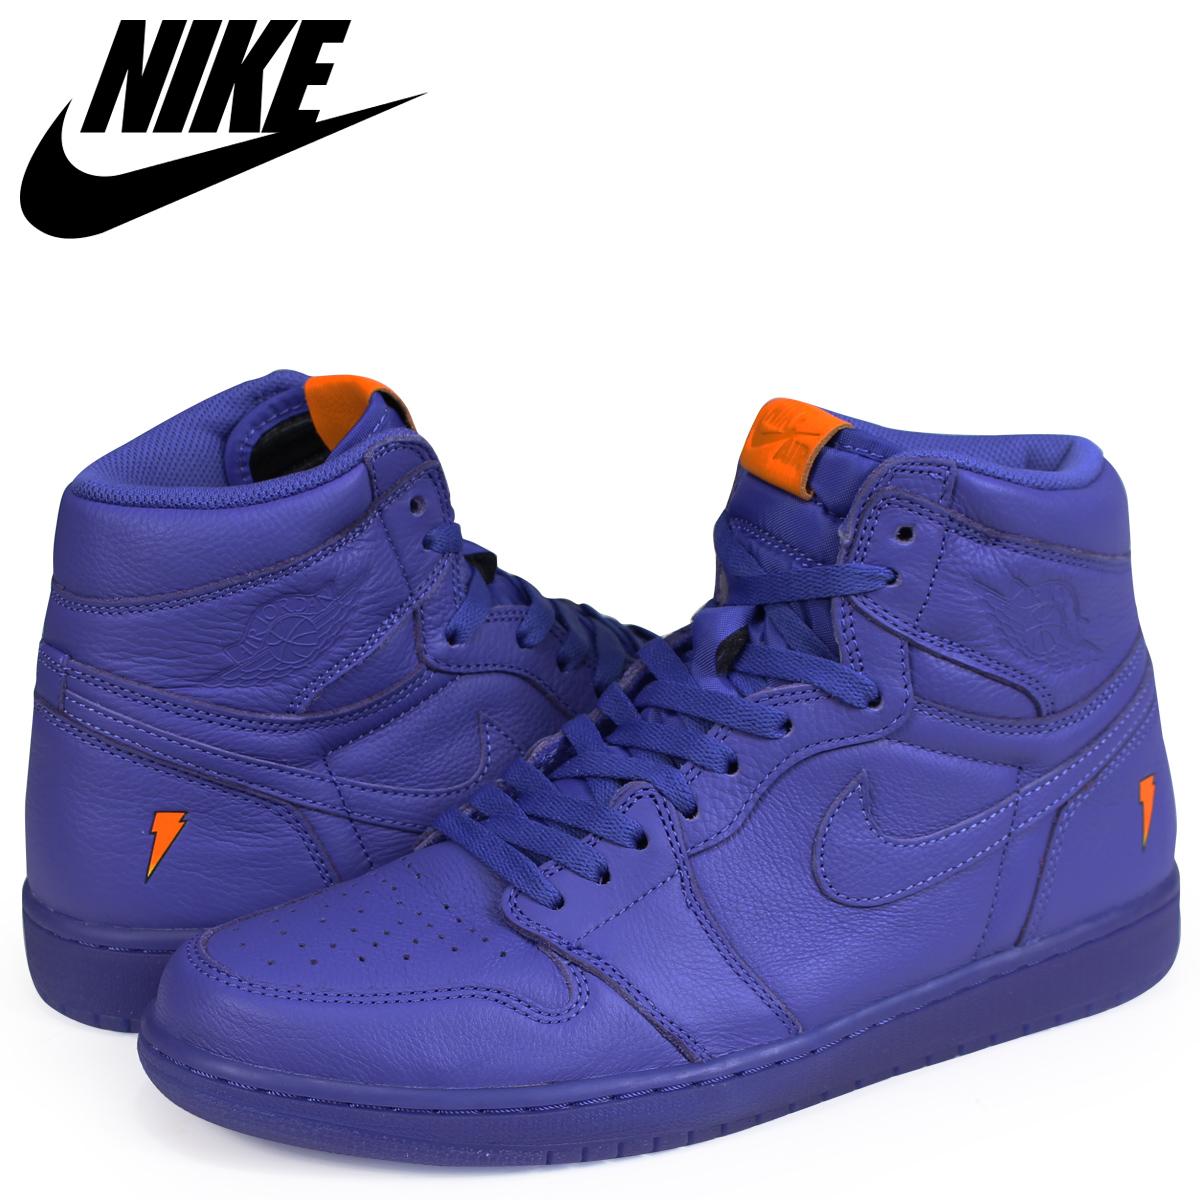 NIKE Nike Air Jordan 1 nostalgic high sneakers men AIR JORDAN 1 RETRO HIGH  OG G8RD BE LIKE MIKE GRAPE AJ5997-555 blue d18fc8112